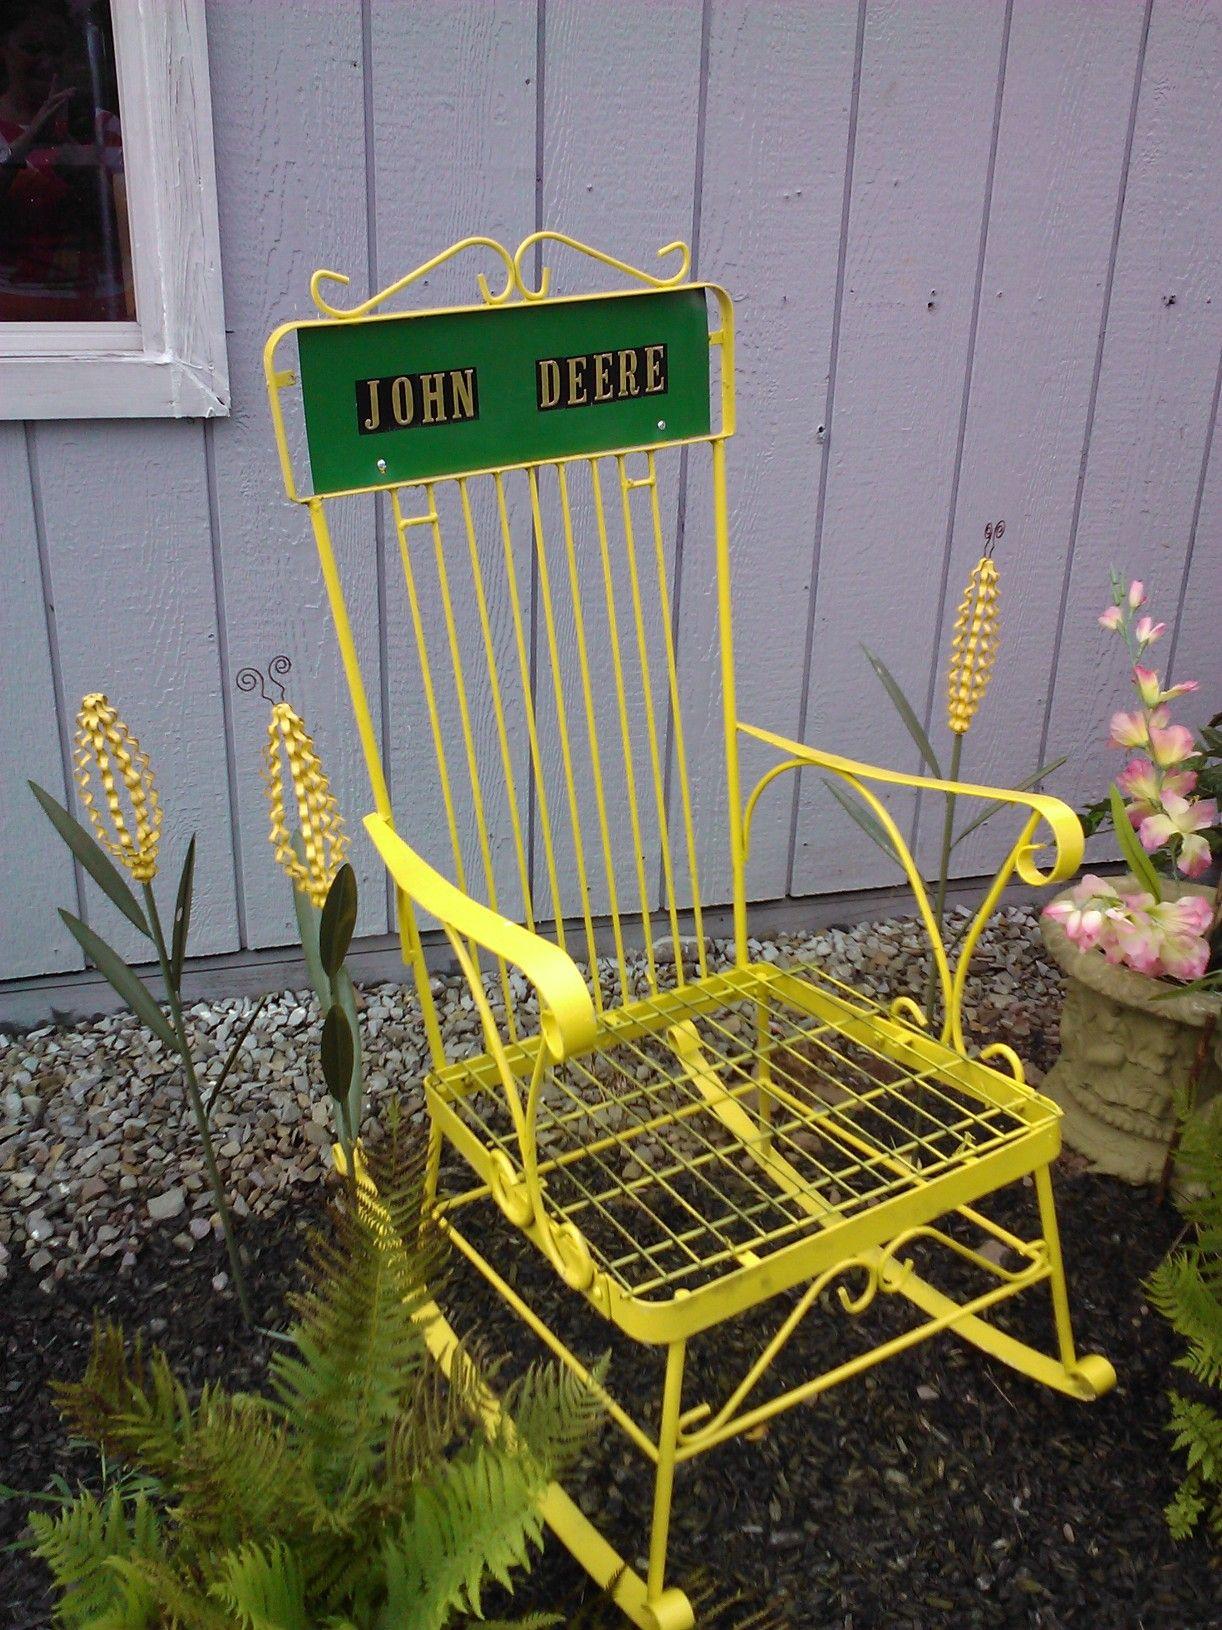 Chair Decorated In John Deer Theme Yard Art